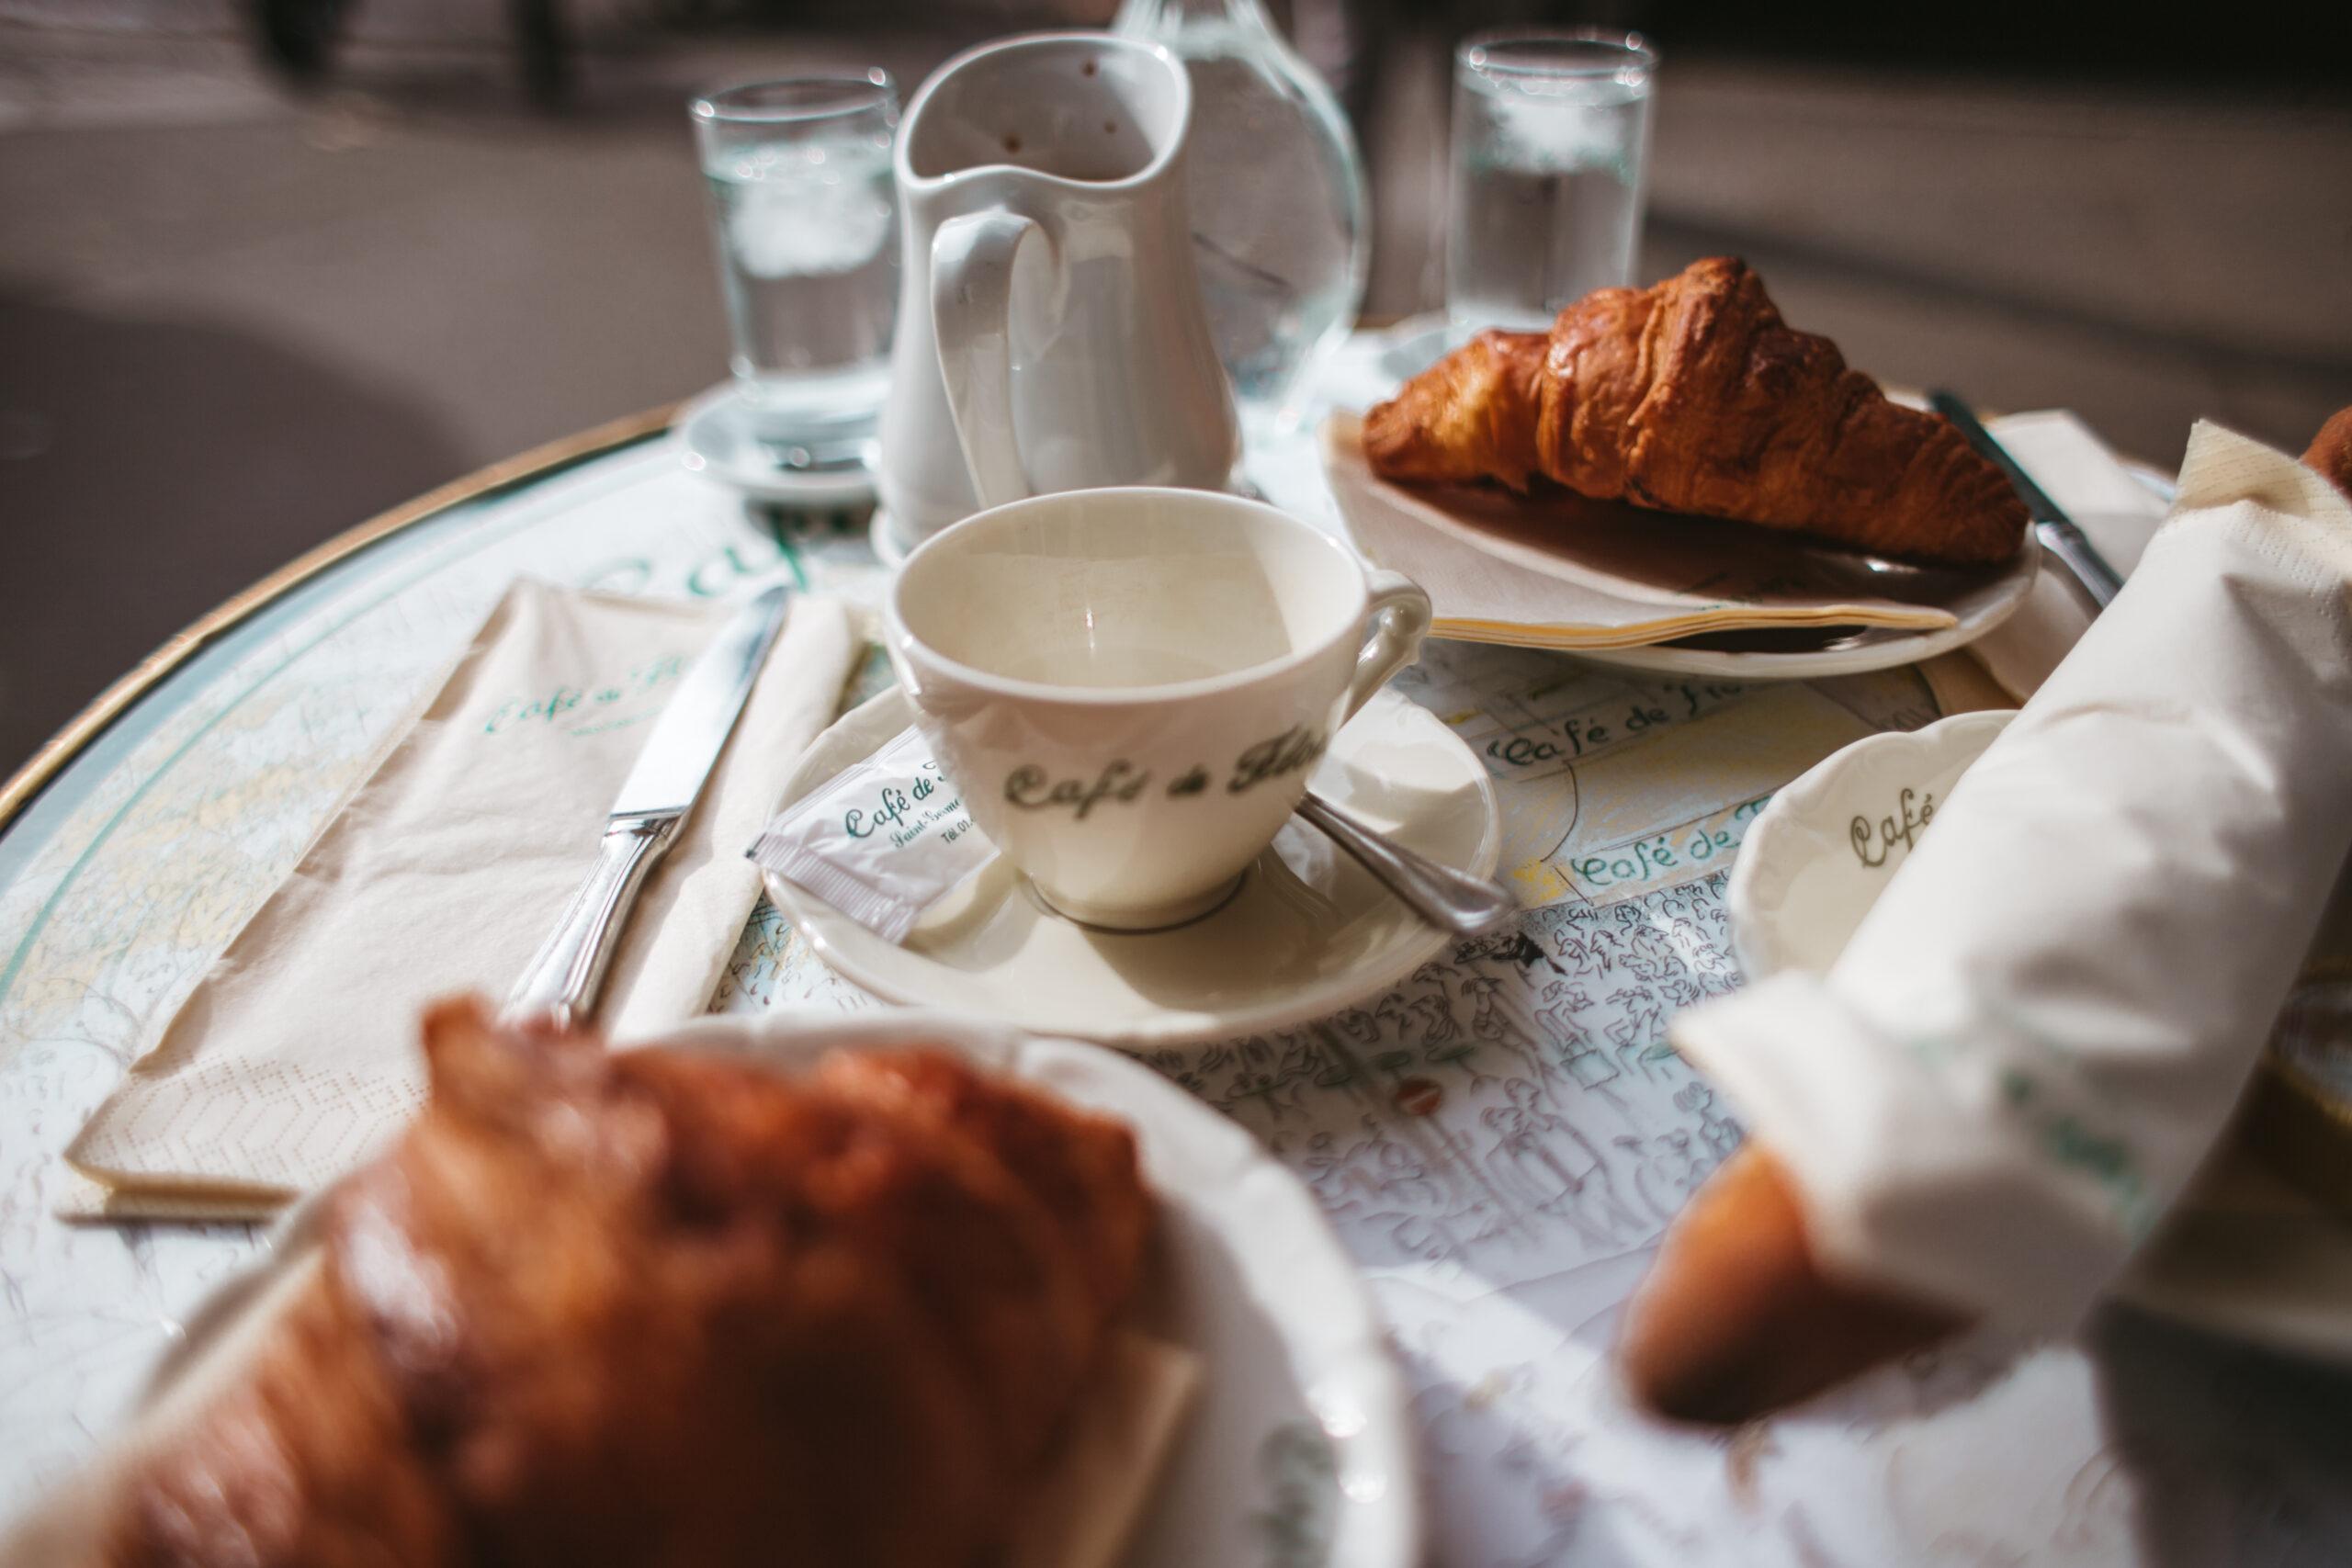 Cafe de Flore, Paris, 6 arrondissement, Paryż kawiarnia, kultowa kawiarnia w paryżu, kawa, paris croissant, Paryż gdzie zjesc